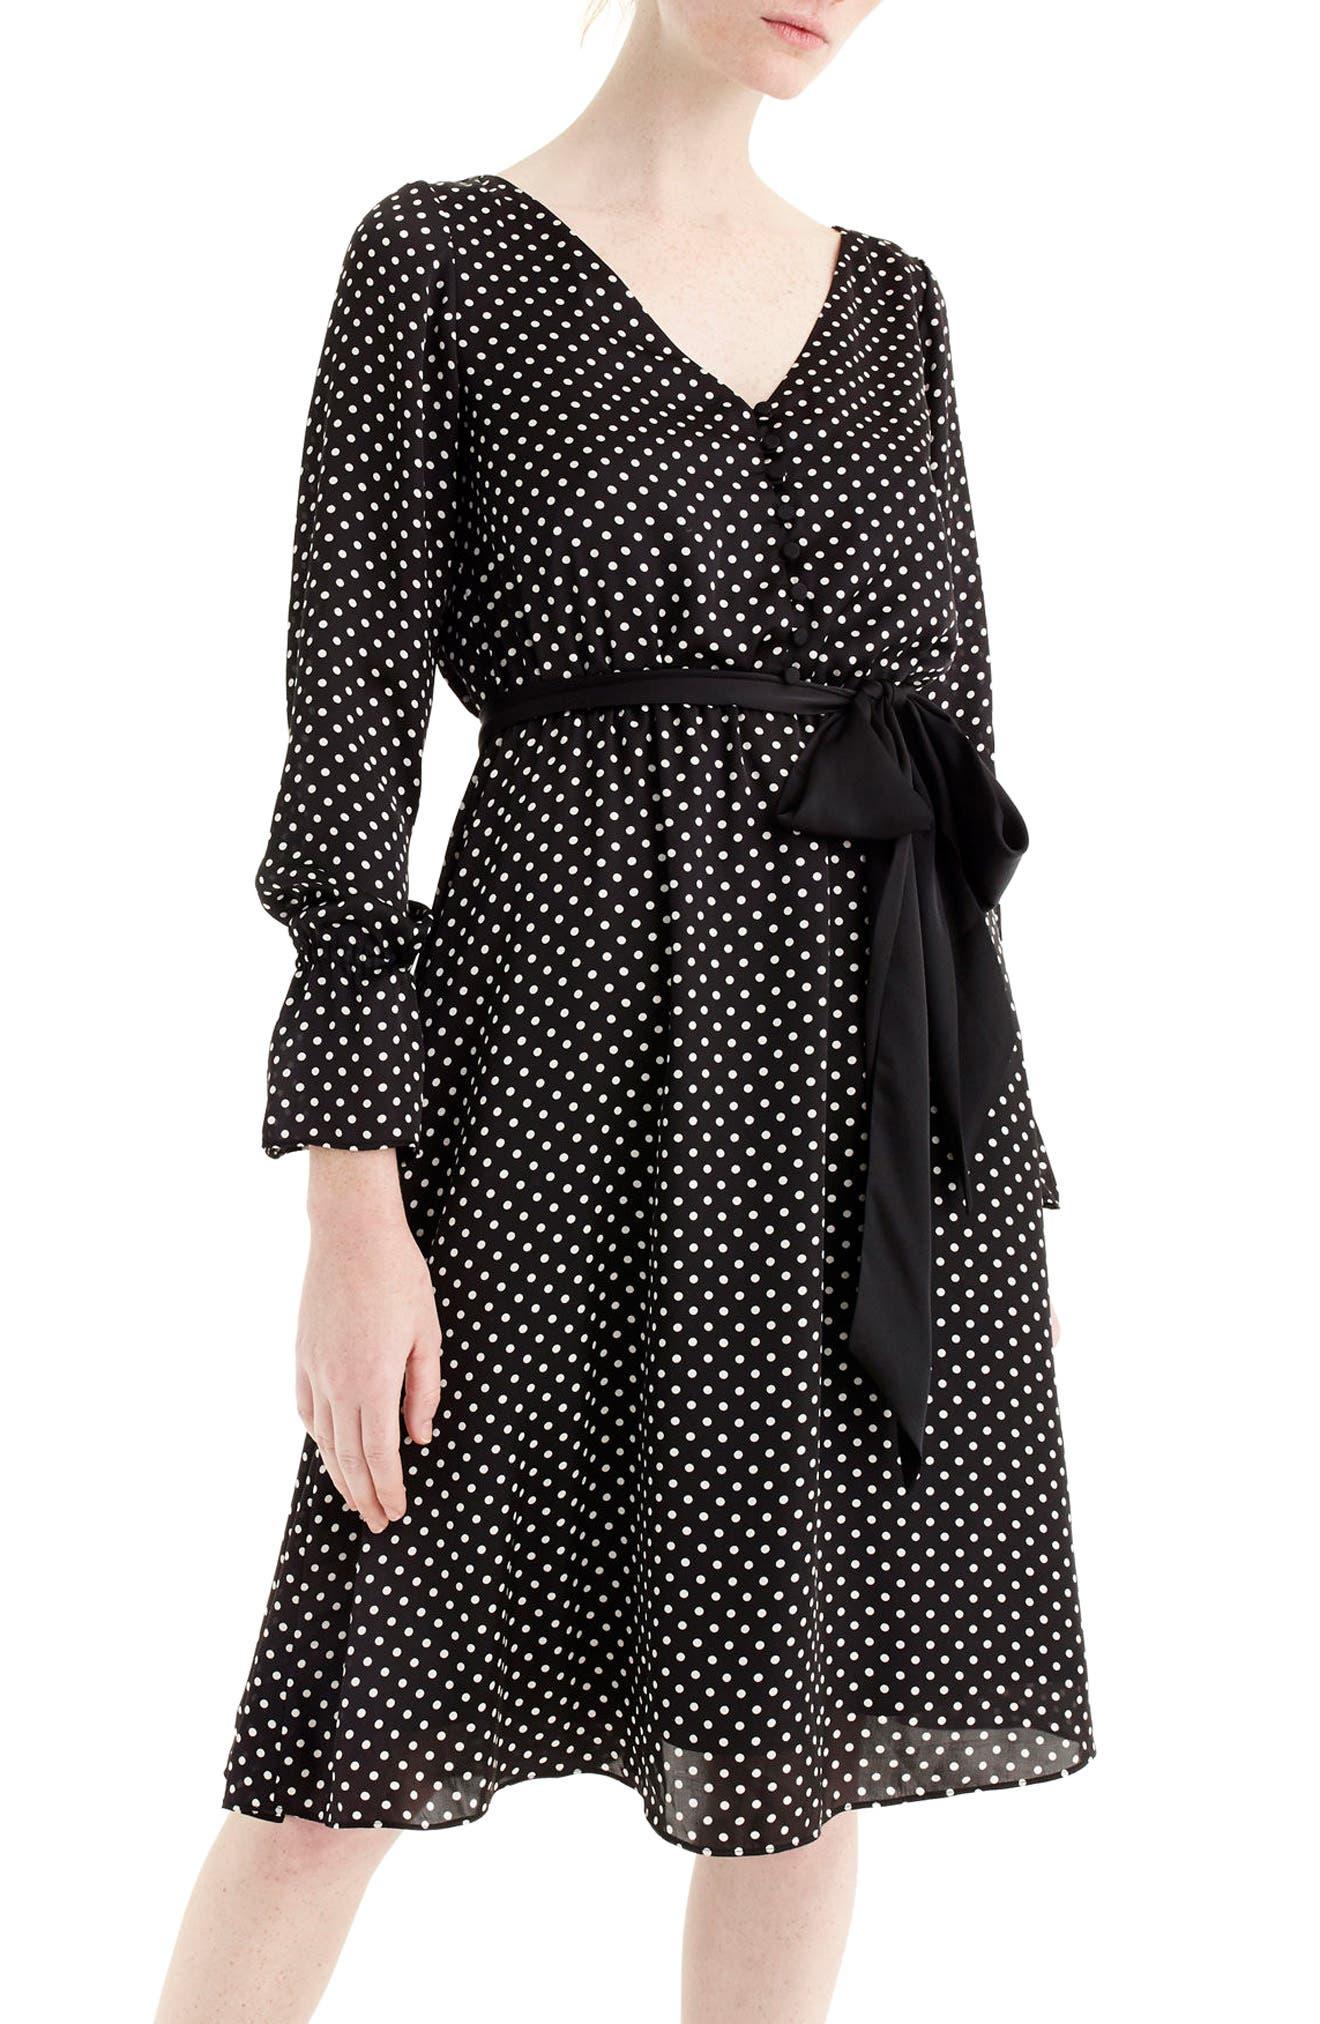 Long Sleeve Polka Dot Dress,                             Main thumbnail 1, color,                             009